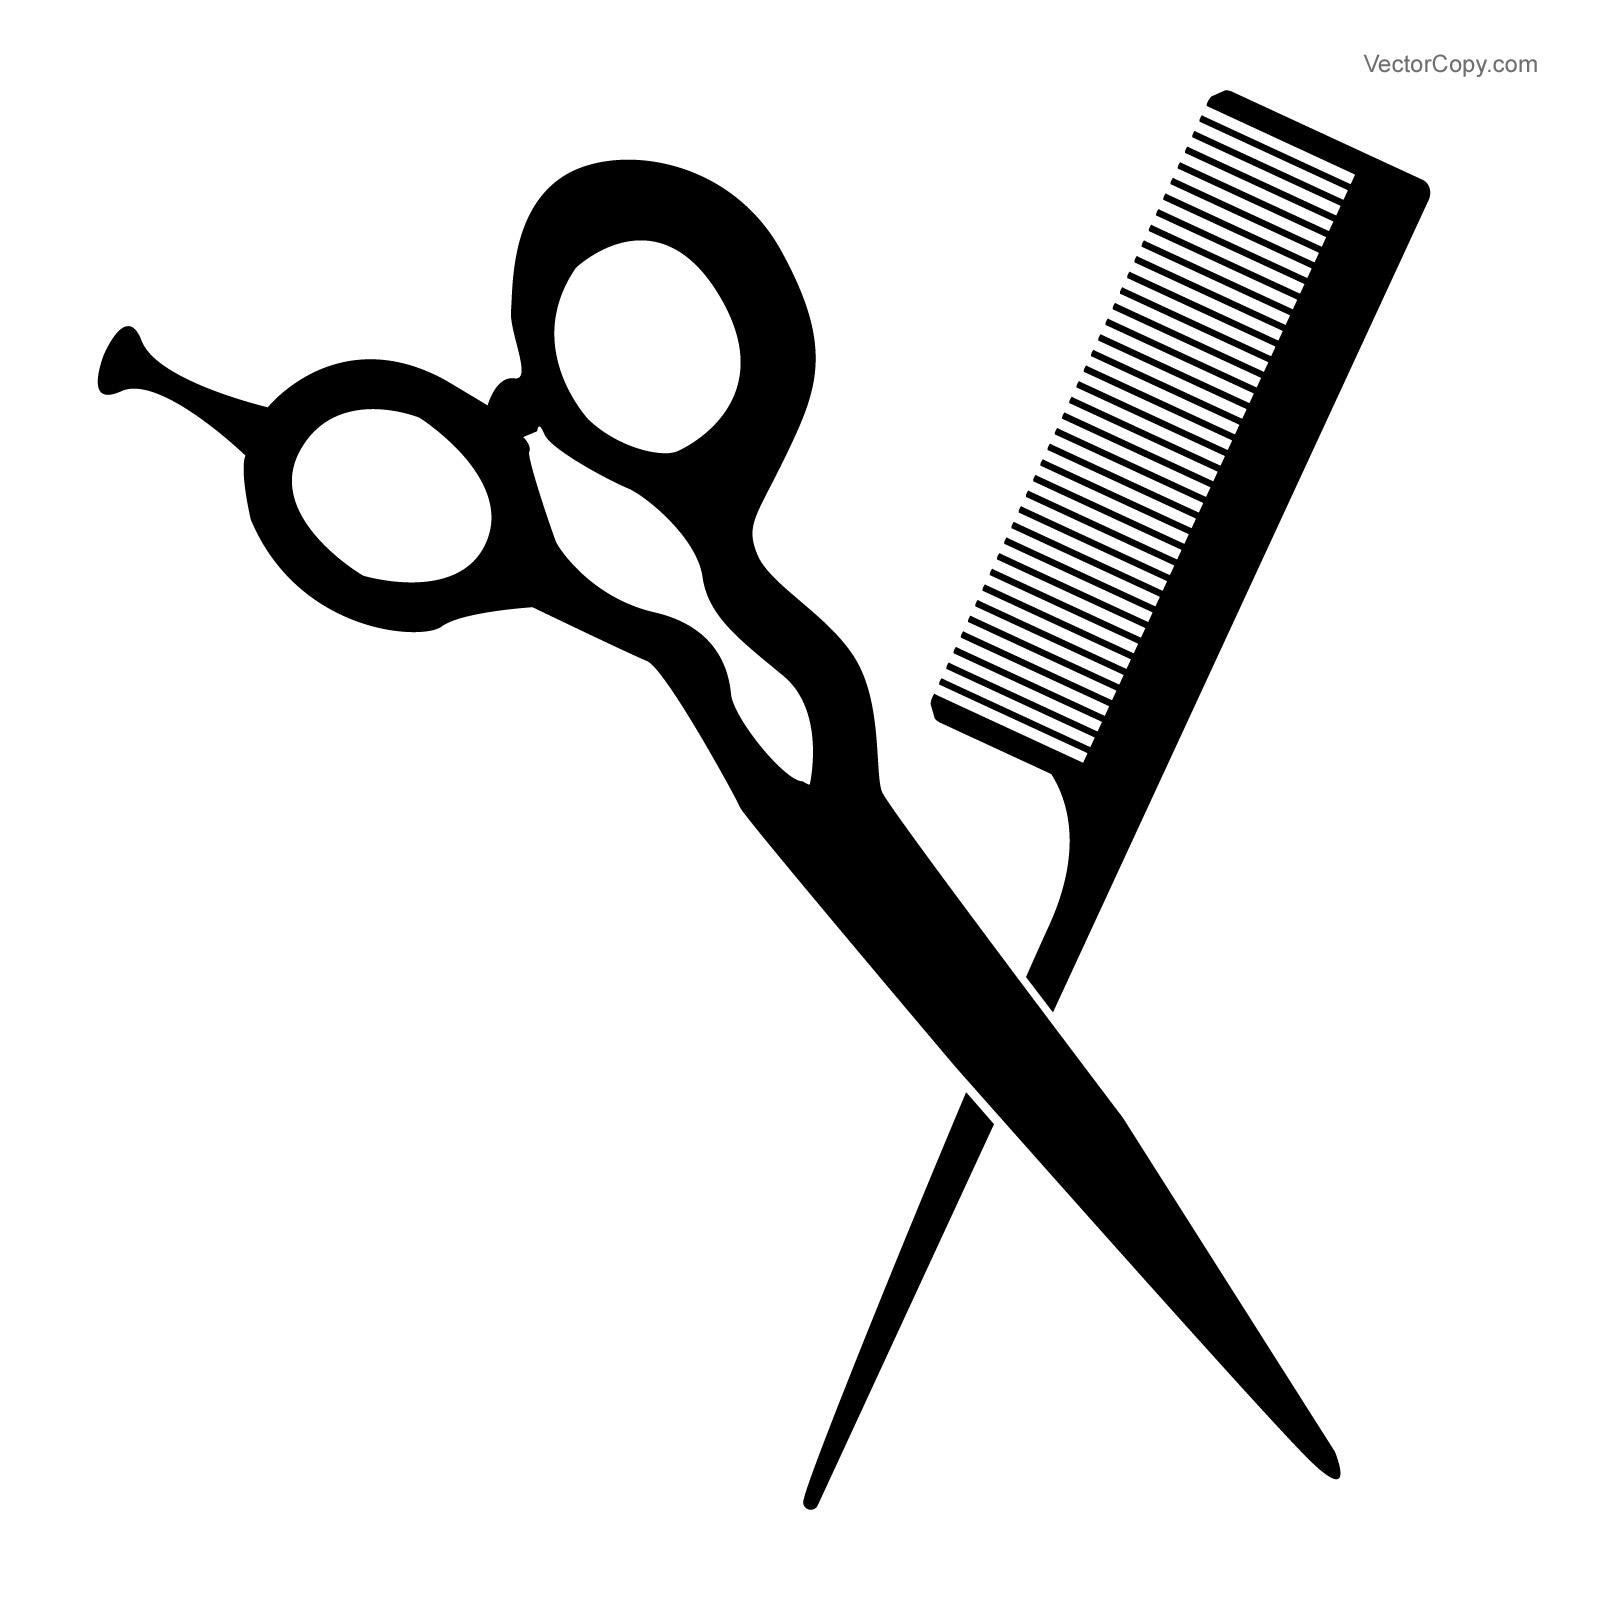 1600x1600 Scissors Free Scissor Andb Clip Art 2